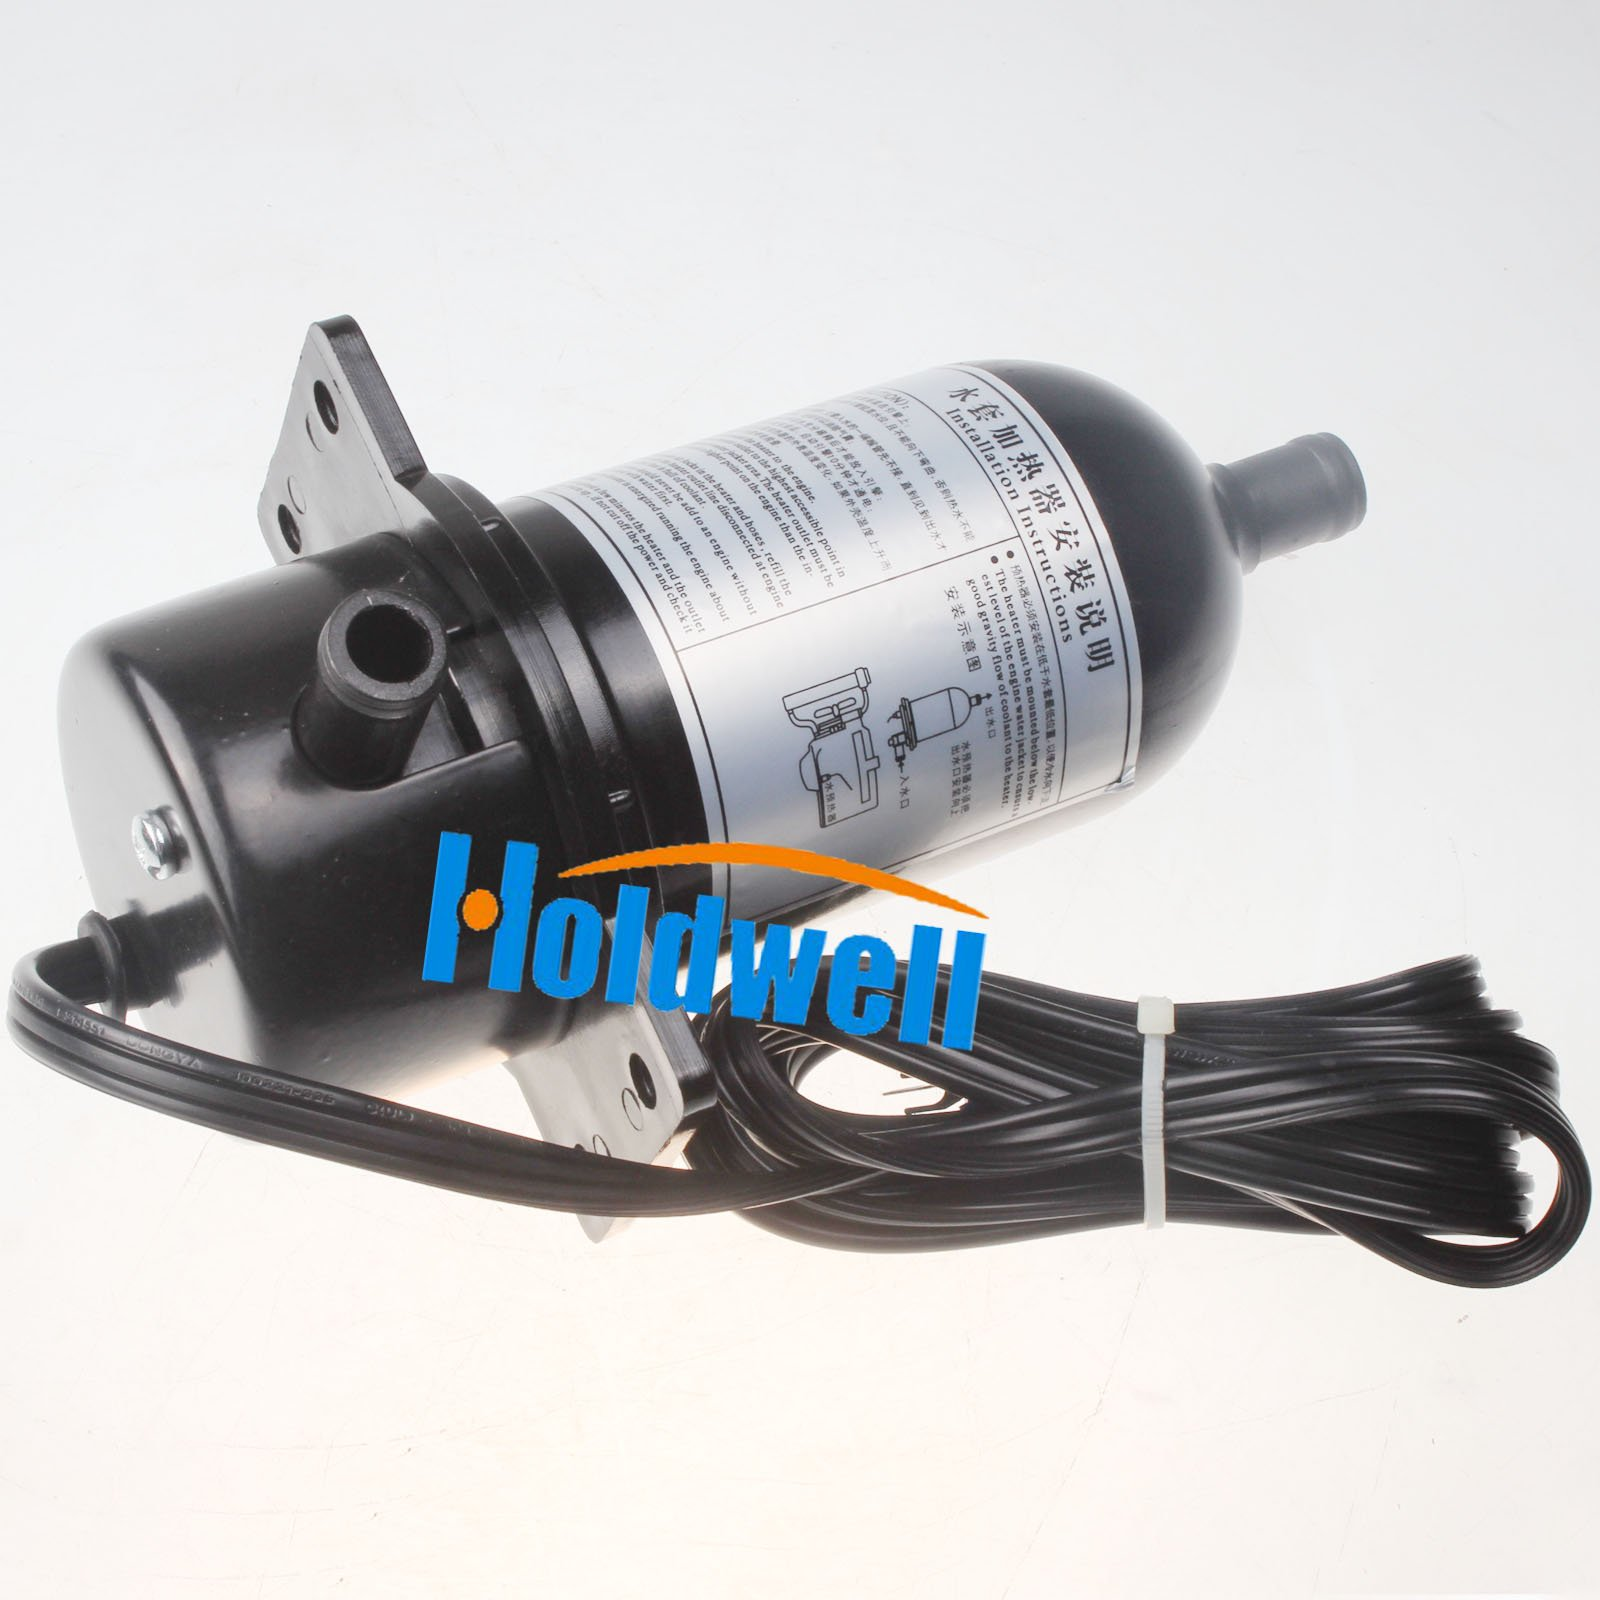 Holdwell Pre-Heater 2000W 240V Pre Heater by Holdwell